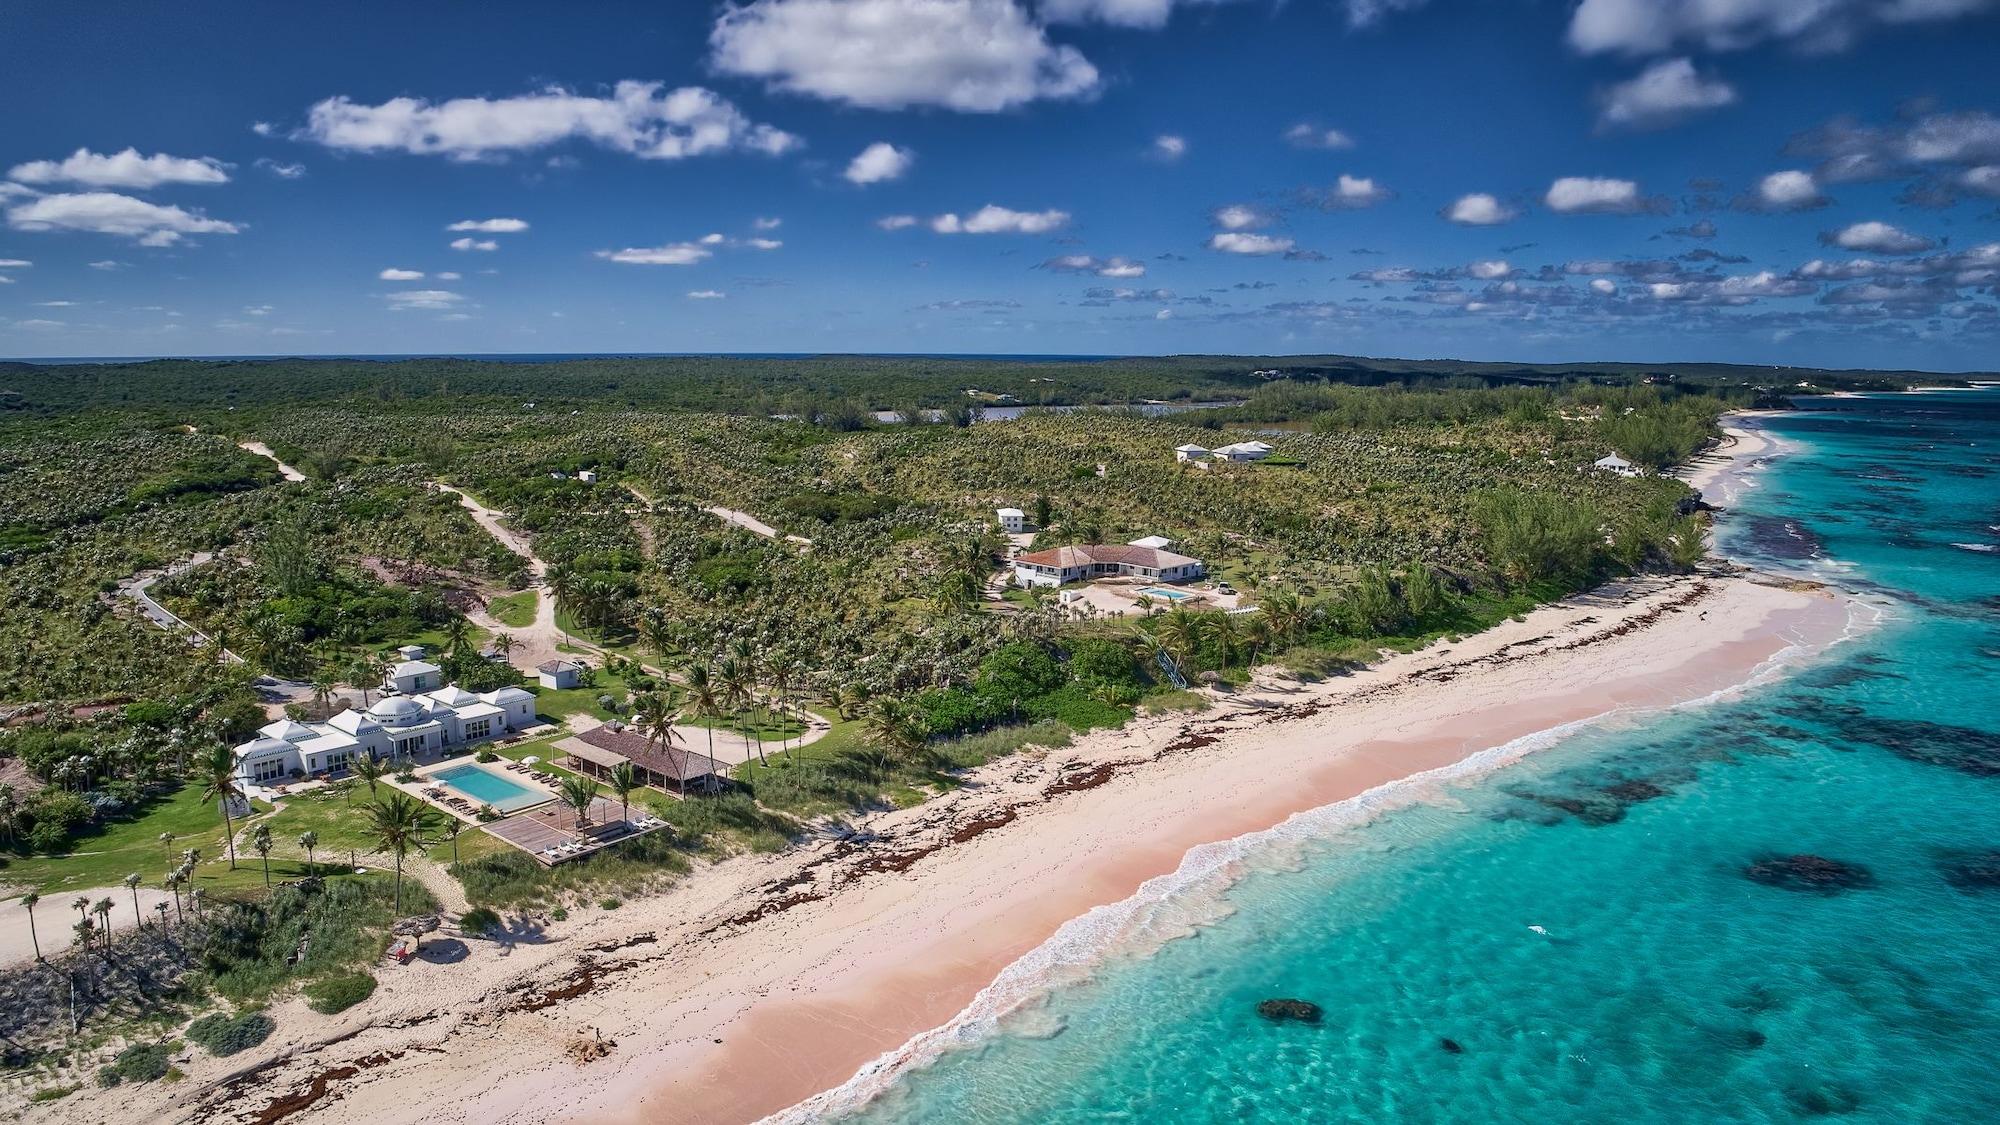 La Bougainvillea Hotel and Villas,